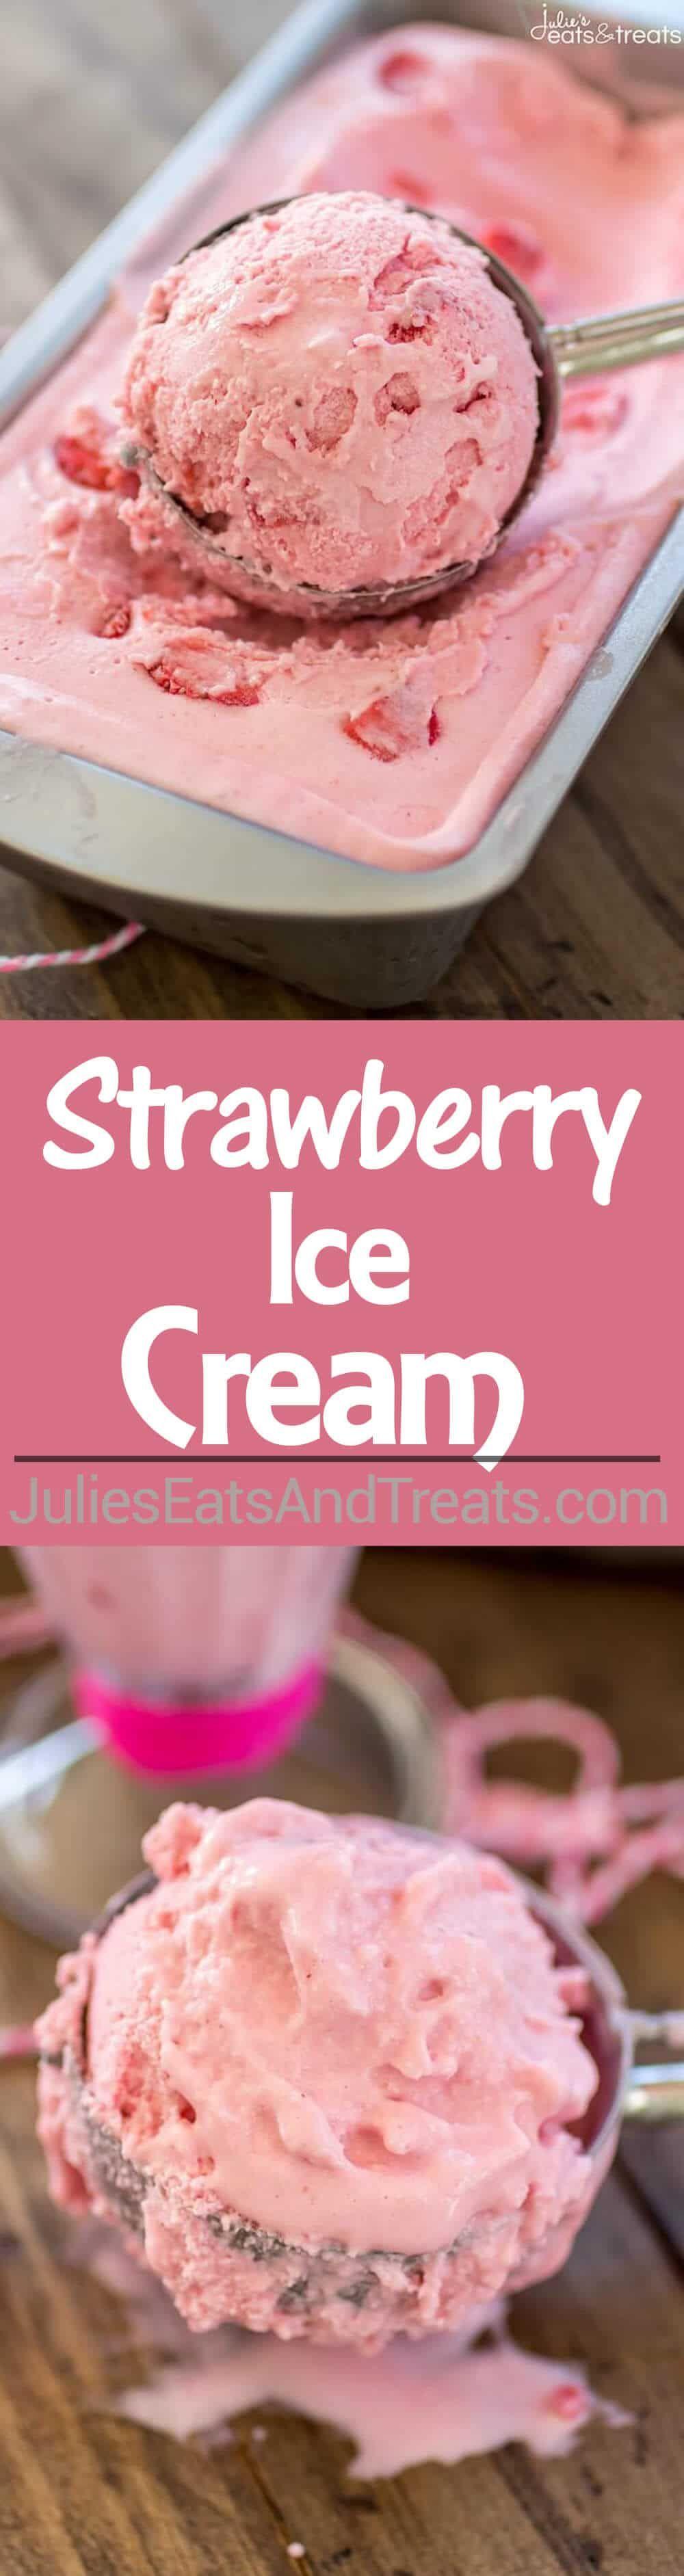 This homemade Strawberry Ice Cream with fresh strawberries! #healthyicecream